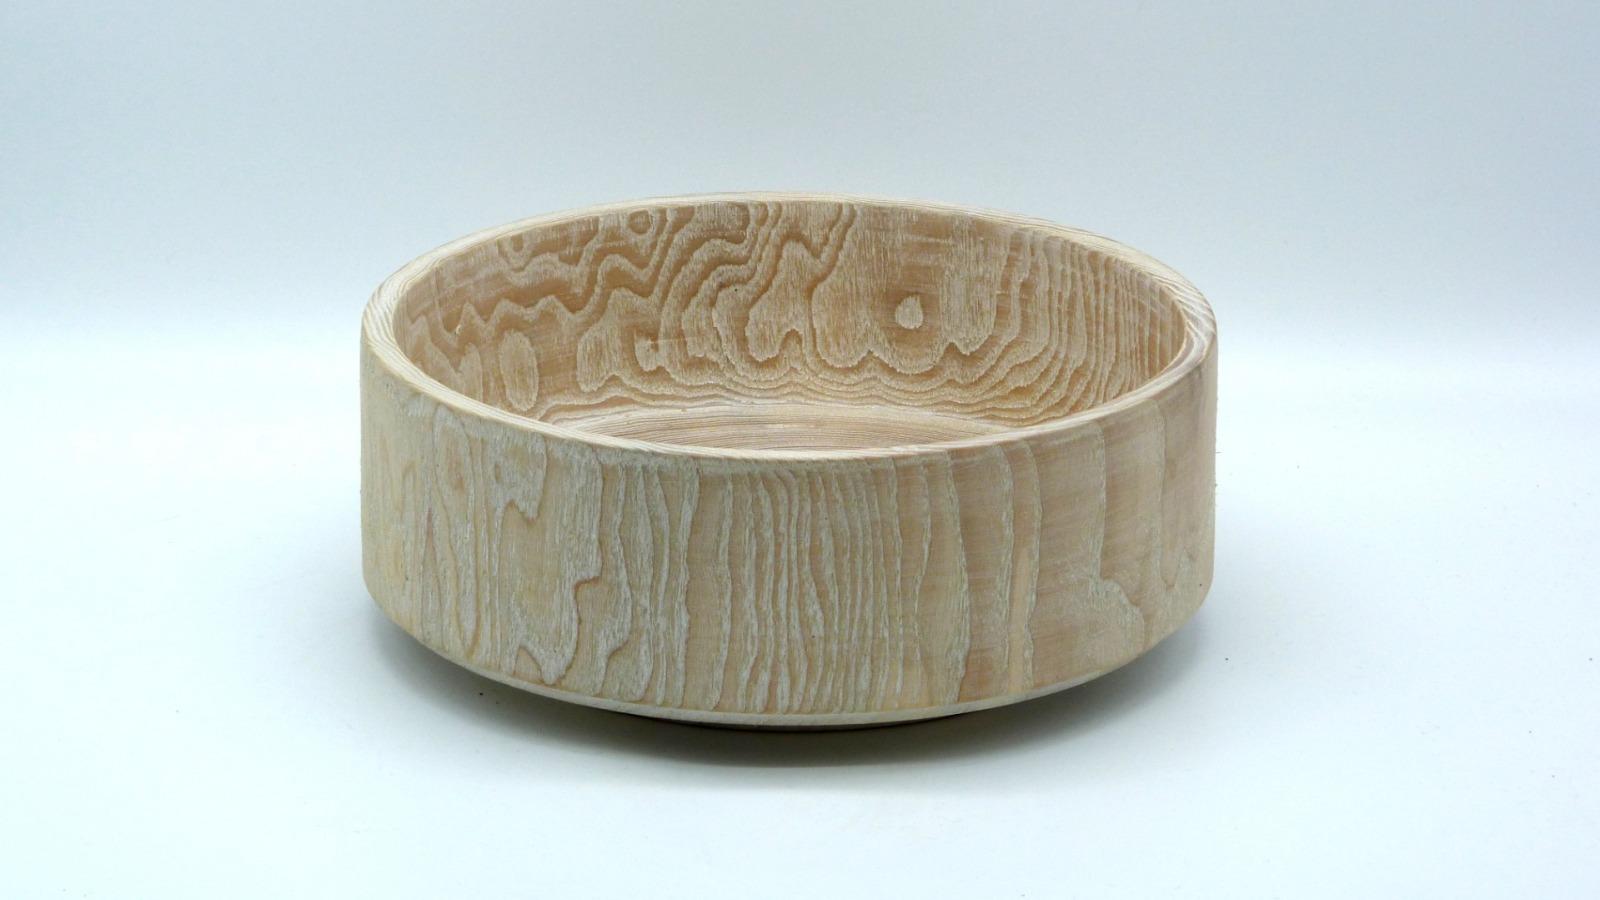 Holzschale weiß aus Lindenholz 7